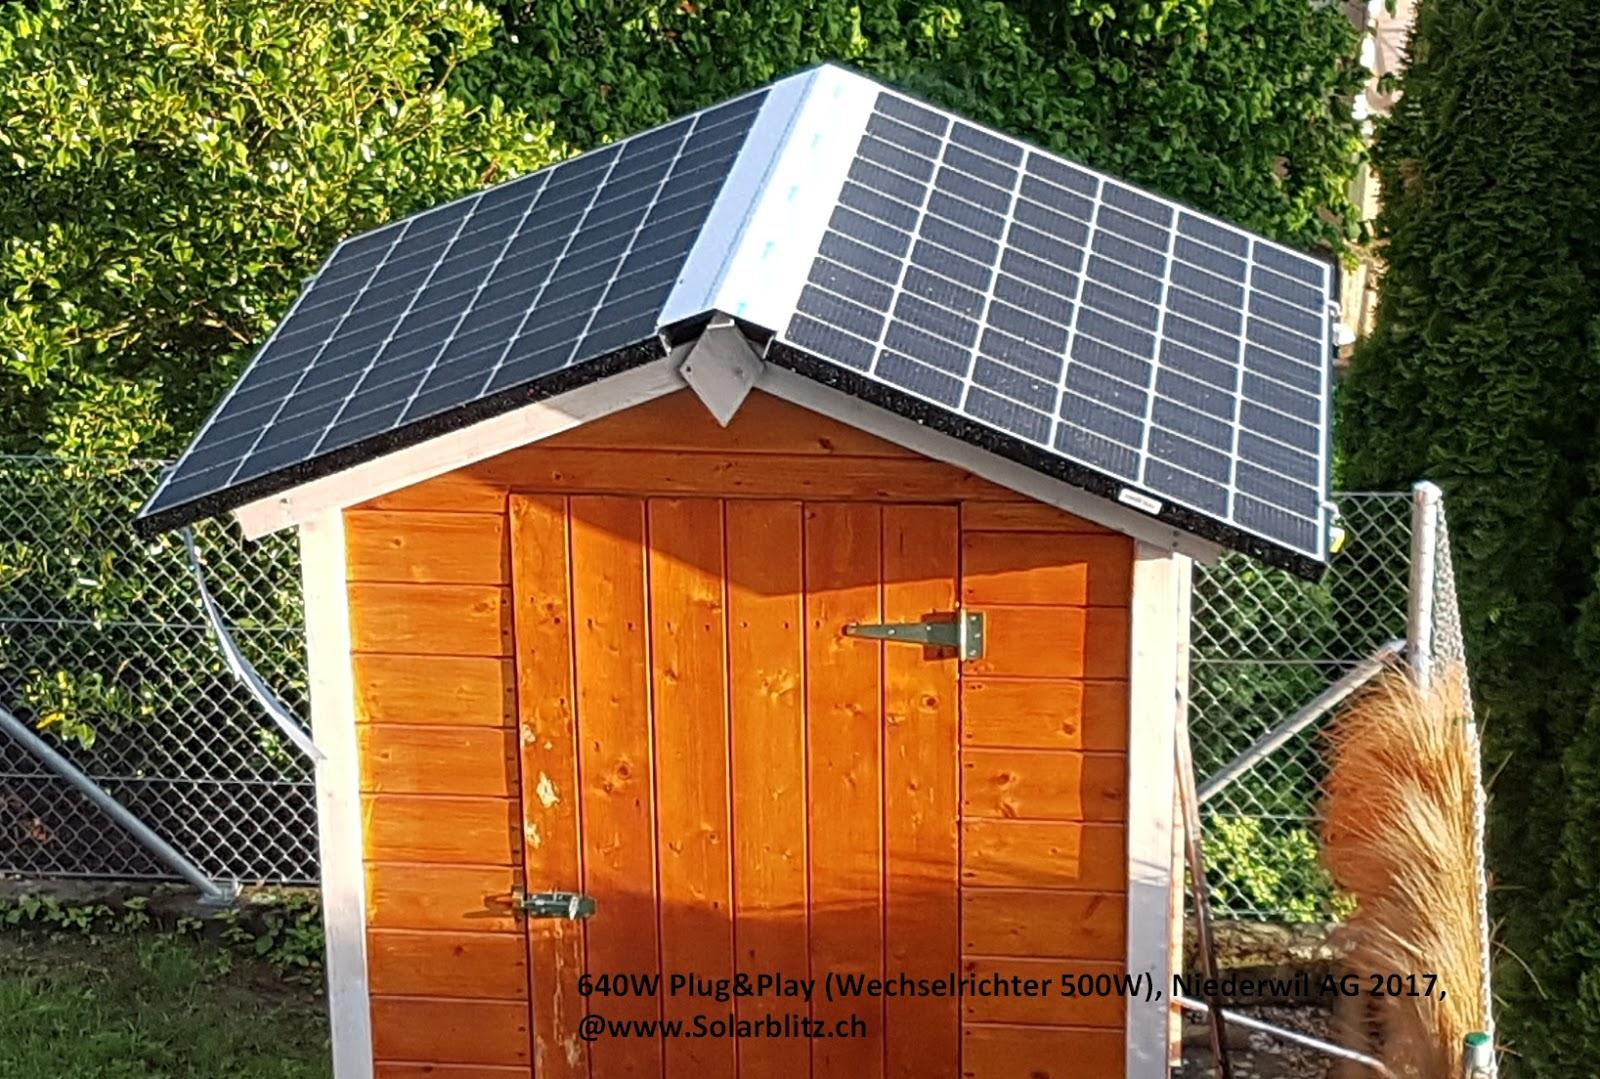 lohnt sich solar fotovoltaik es lohnt sich with lohnt sich solar direkt zum with lohnt sich. Black Bedroom Furniture Sets. Home Design Ideas